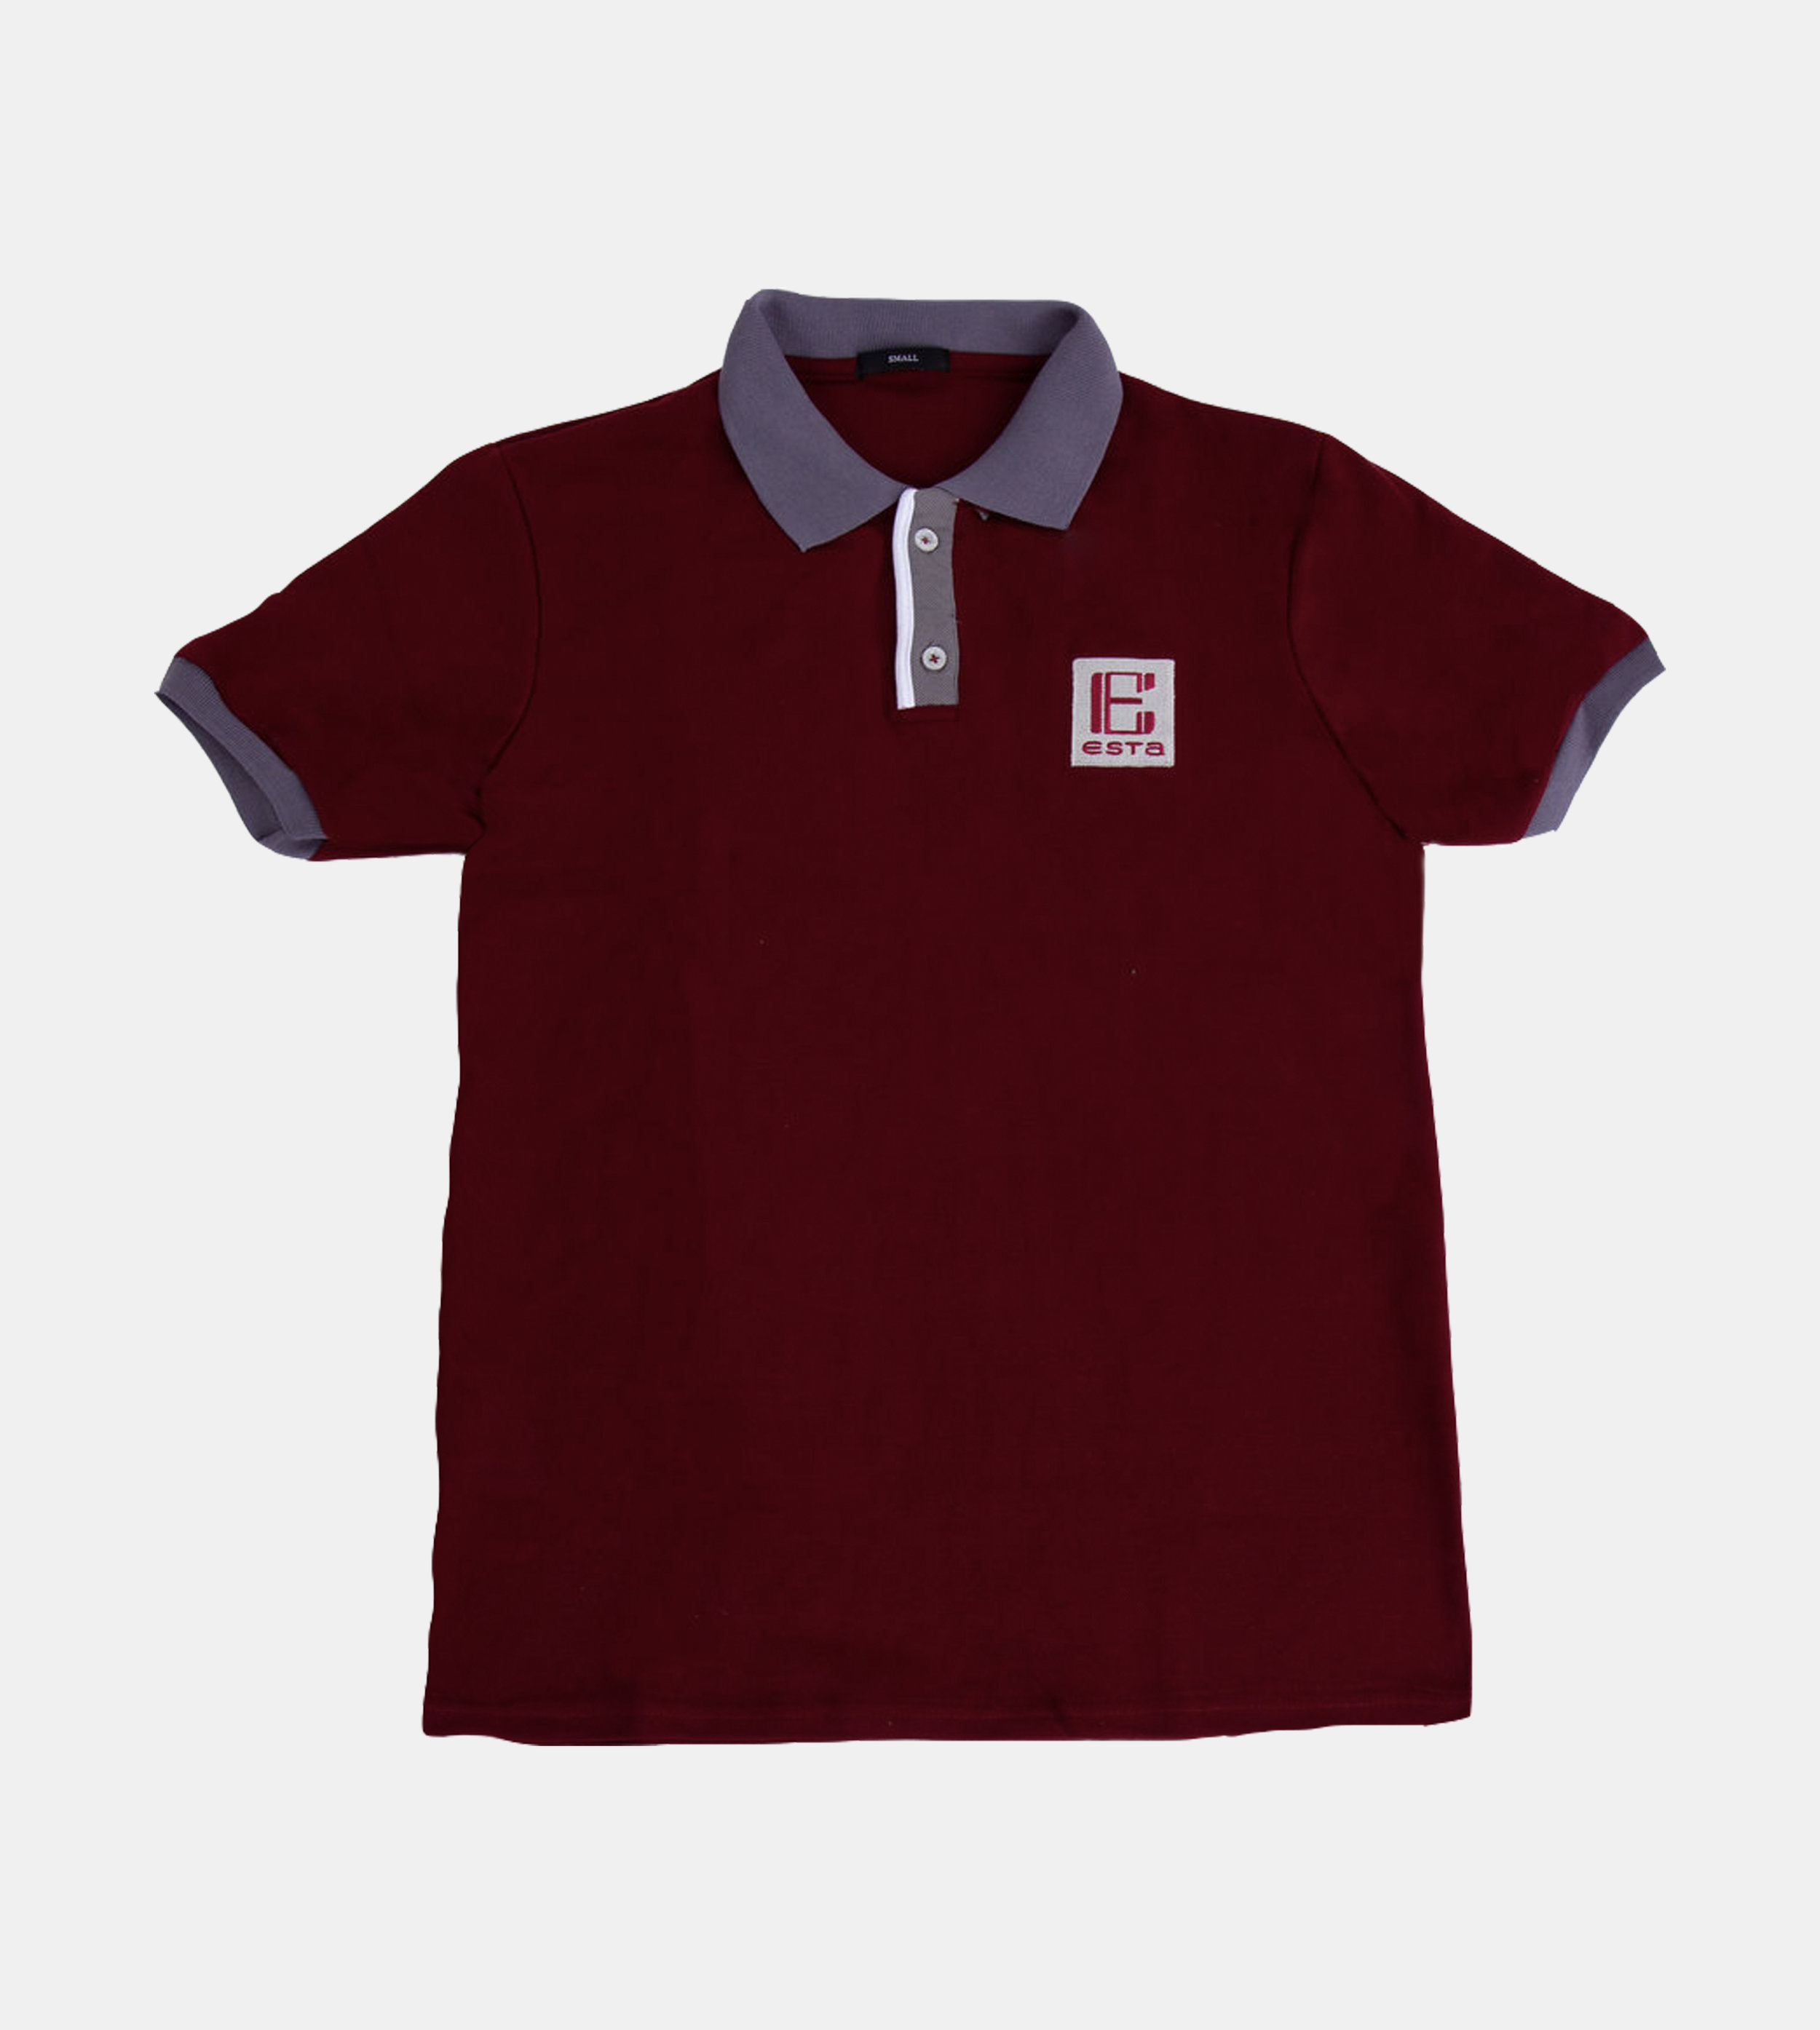 Tailored Projects-Custom Shirt-Polo Shirt-Estafine.jpg